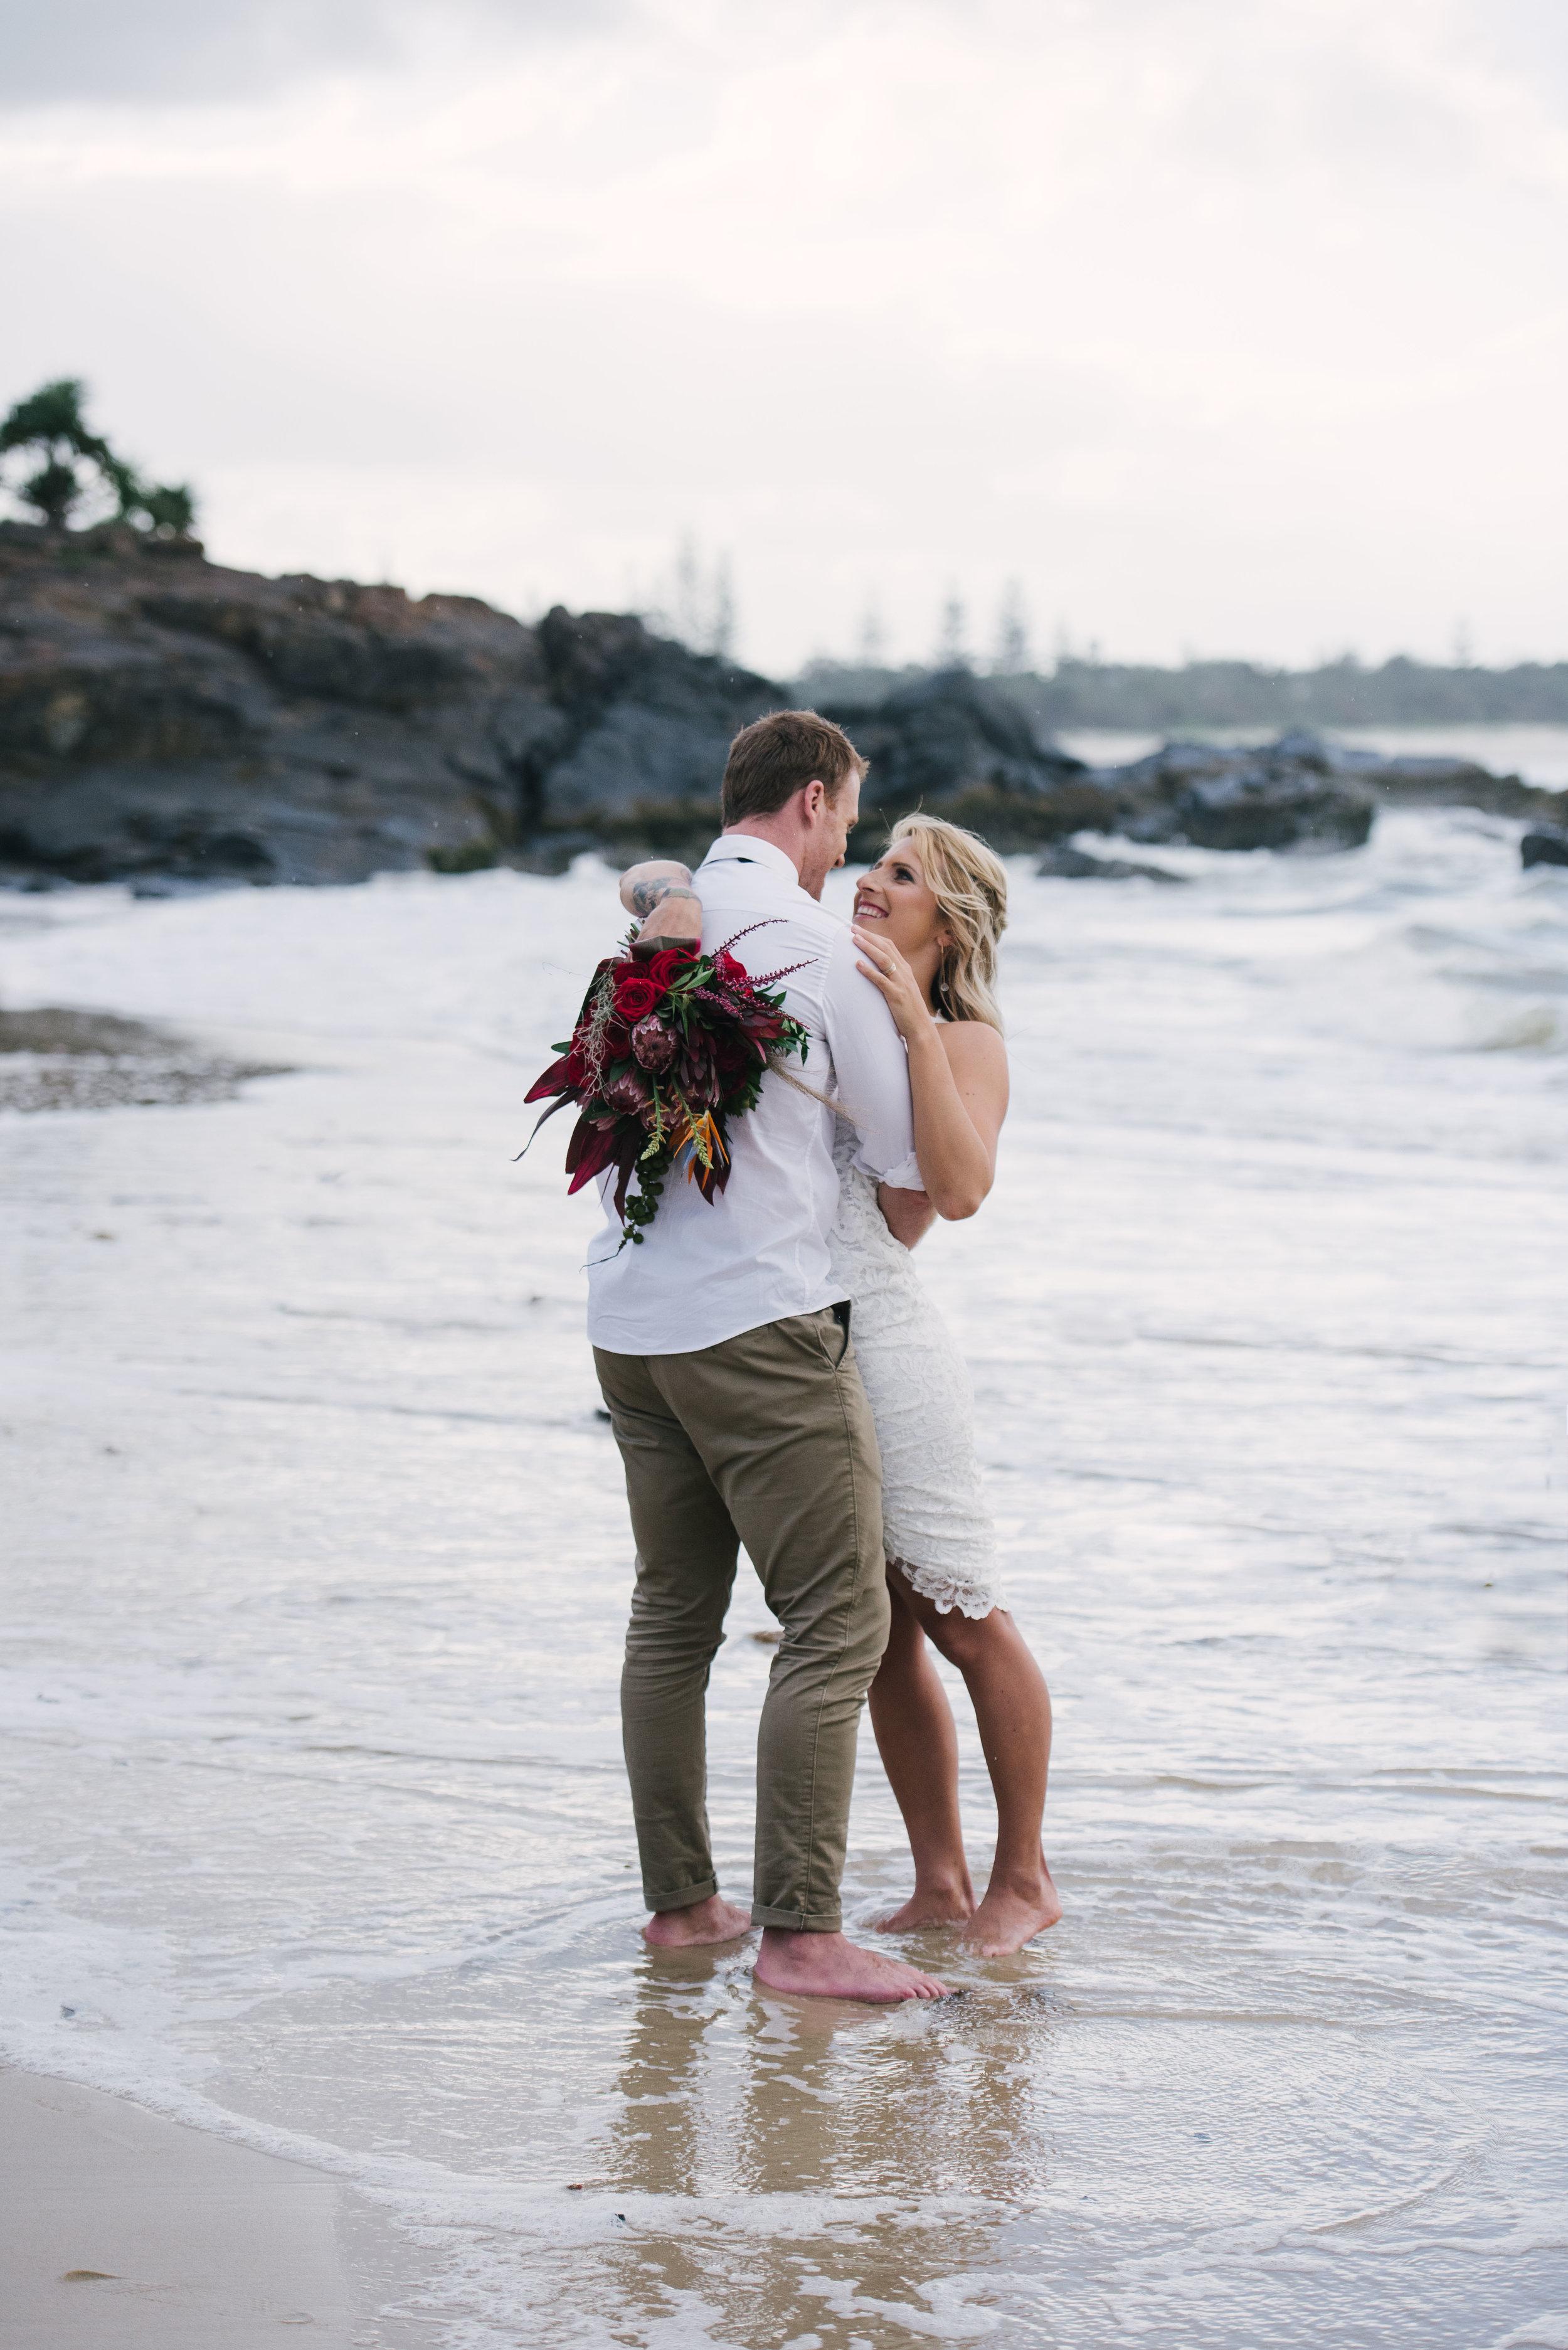 Jess and Darren- wedding photographer, byron bay wedding and family photographer, tweed heads wedding and family photography-176.jpg